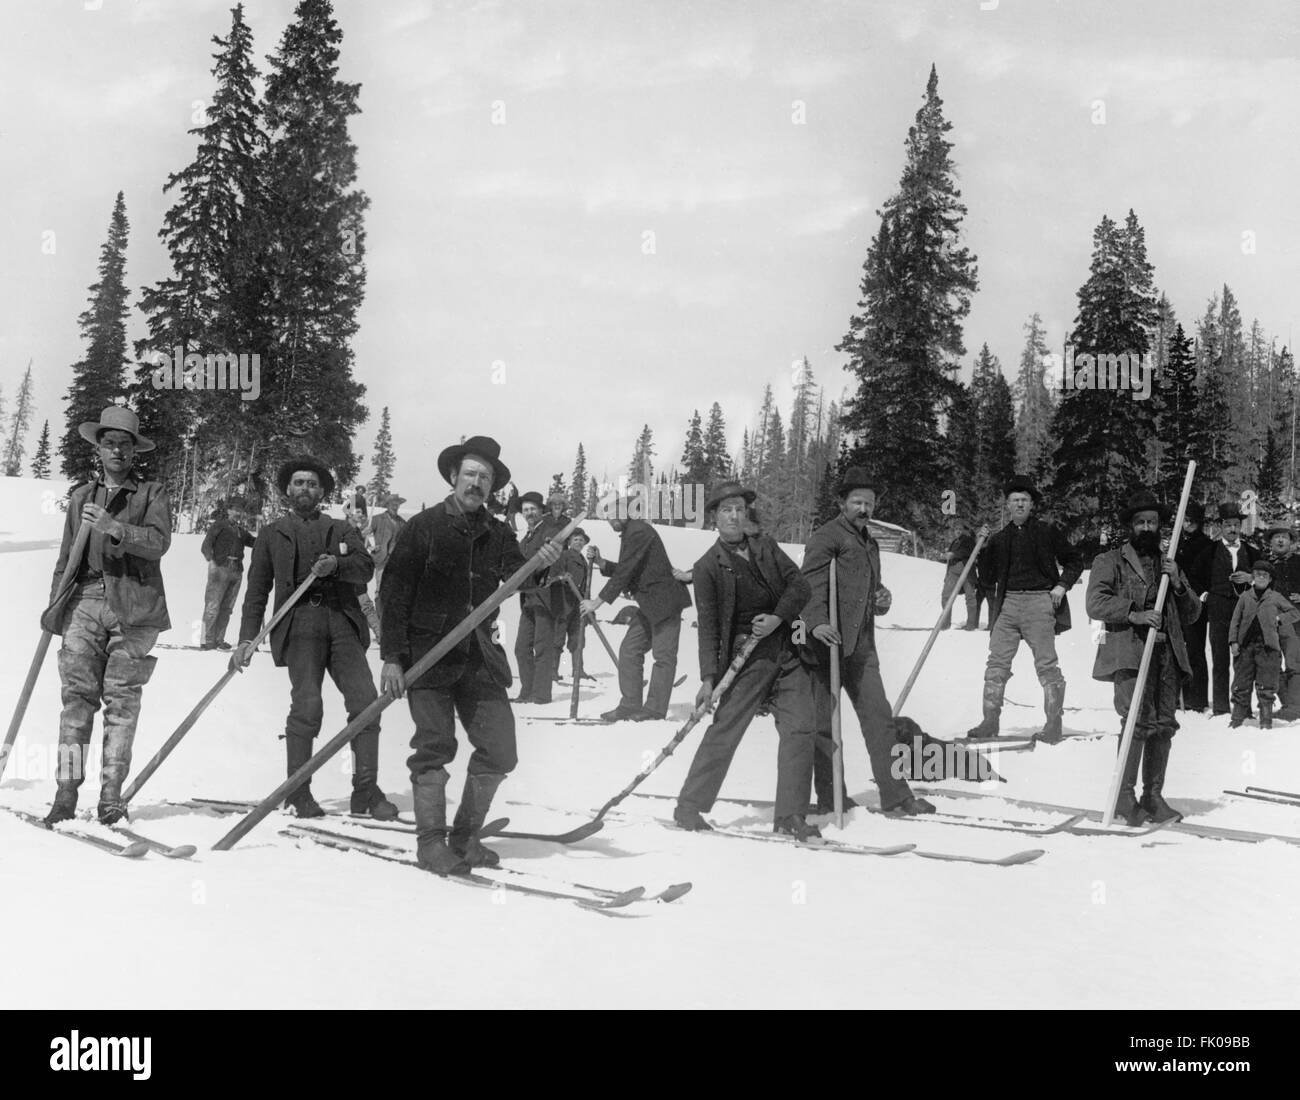 Grupo de esquiadores, EEUU, circa 1915 Imagen De Stock